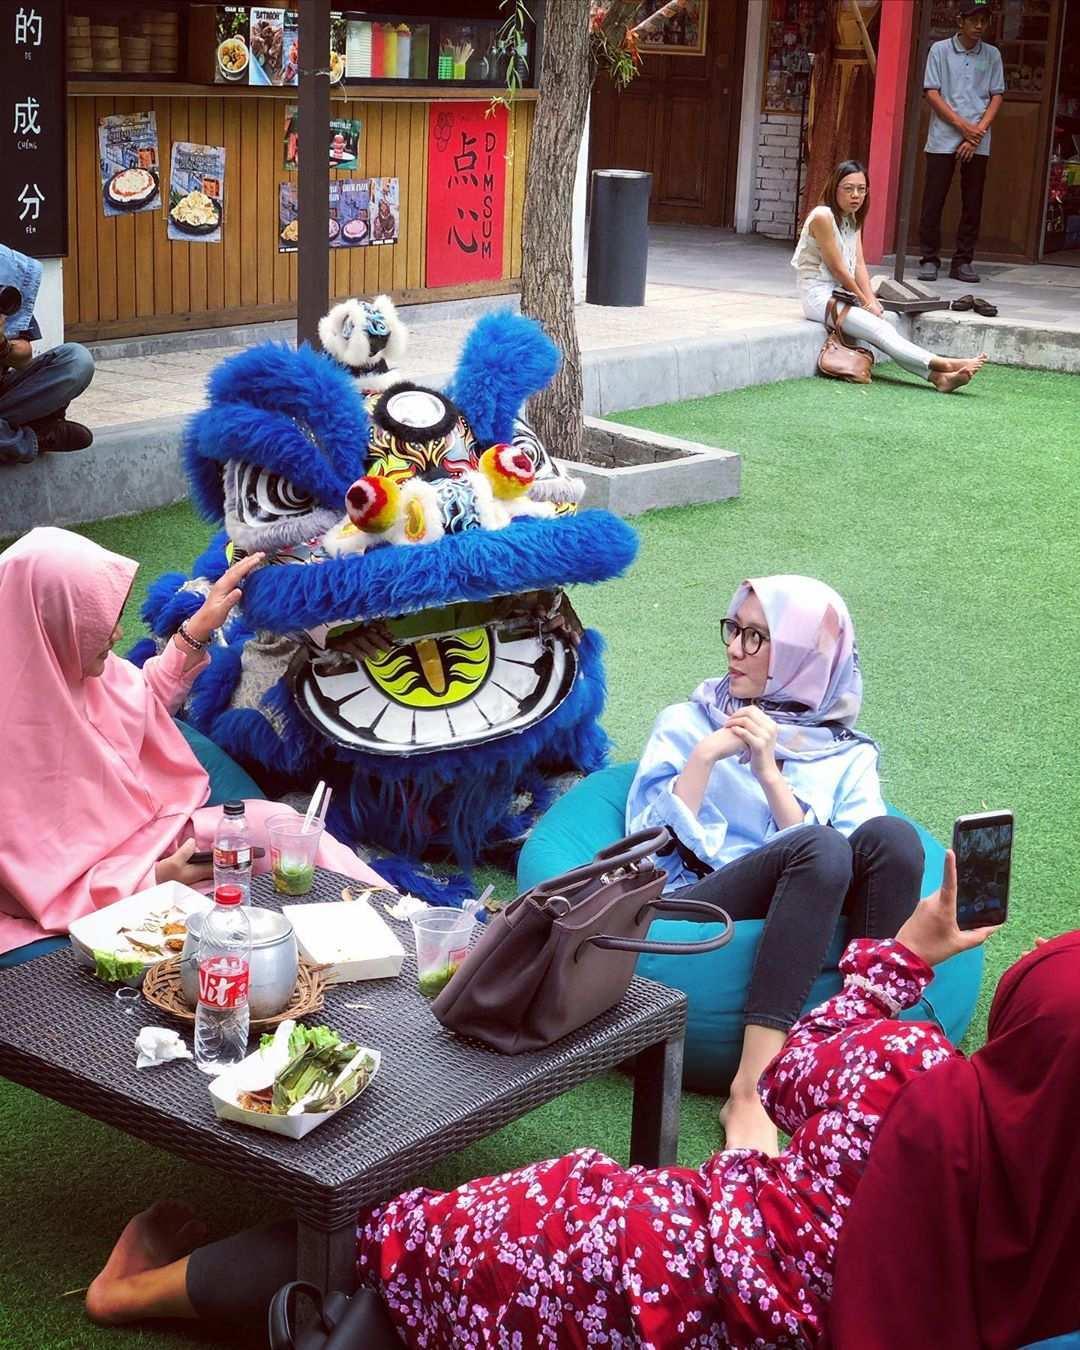 Berfoto Dengan Barongsai di Chinatown Bandung, Image From @chinatownbandung